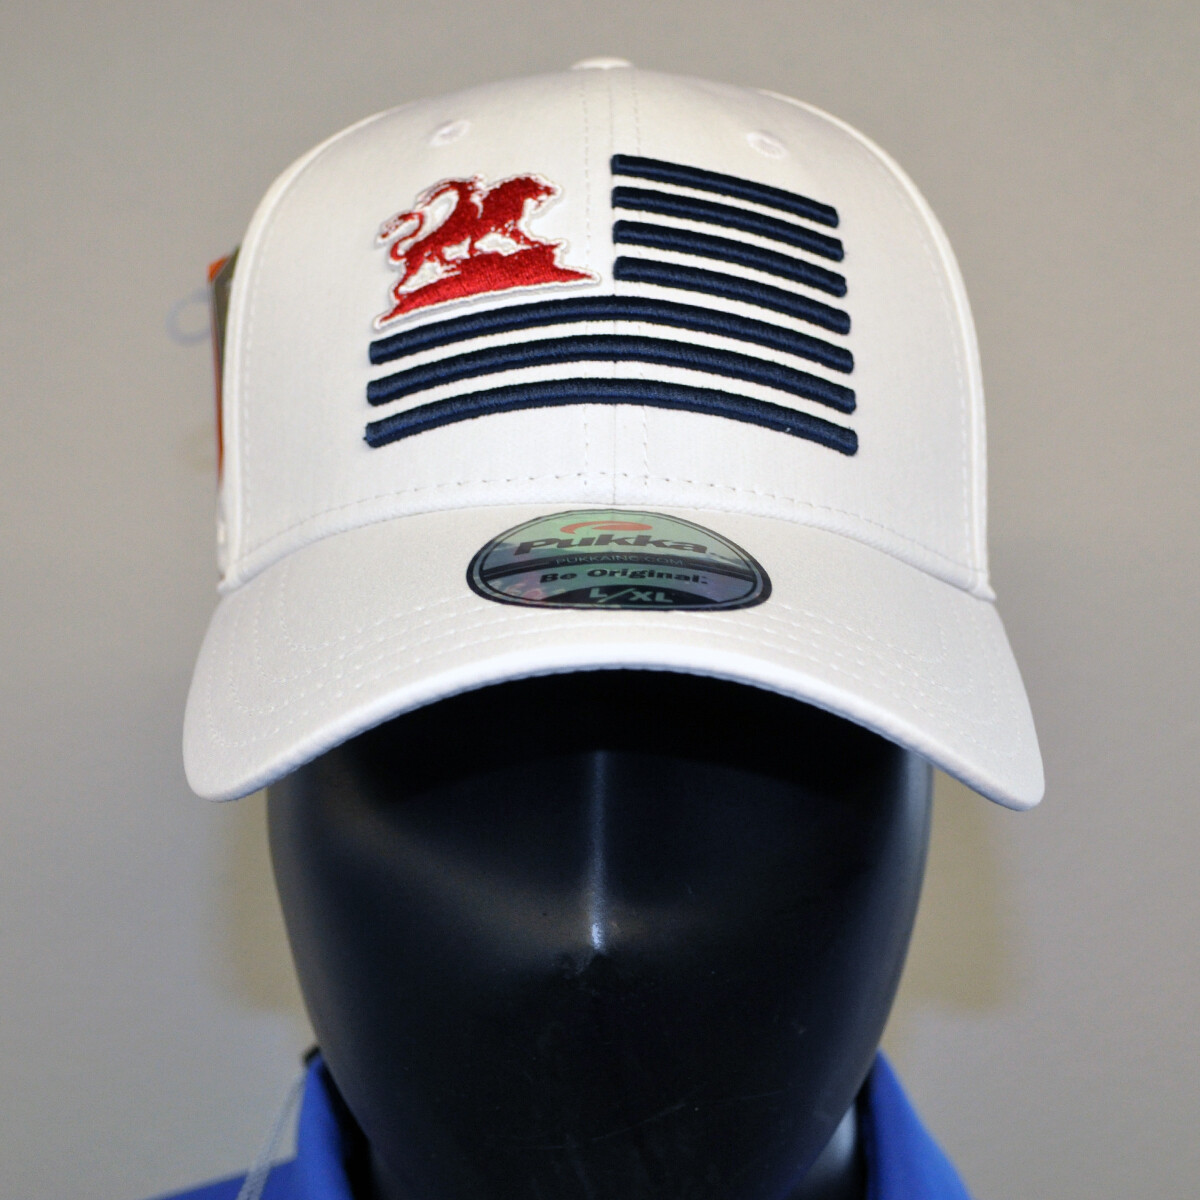 Men's Golf Hat - White/Red/Blue